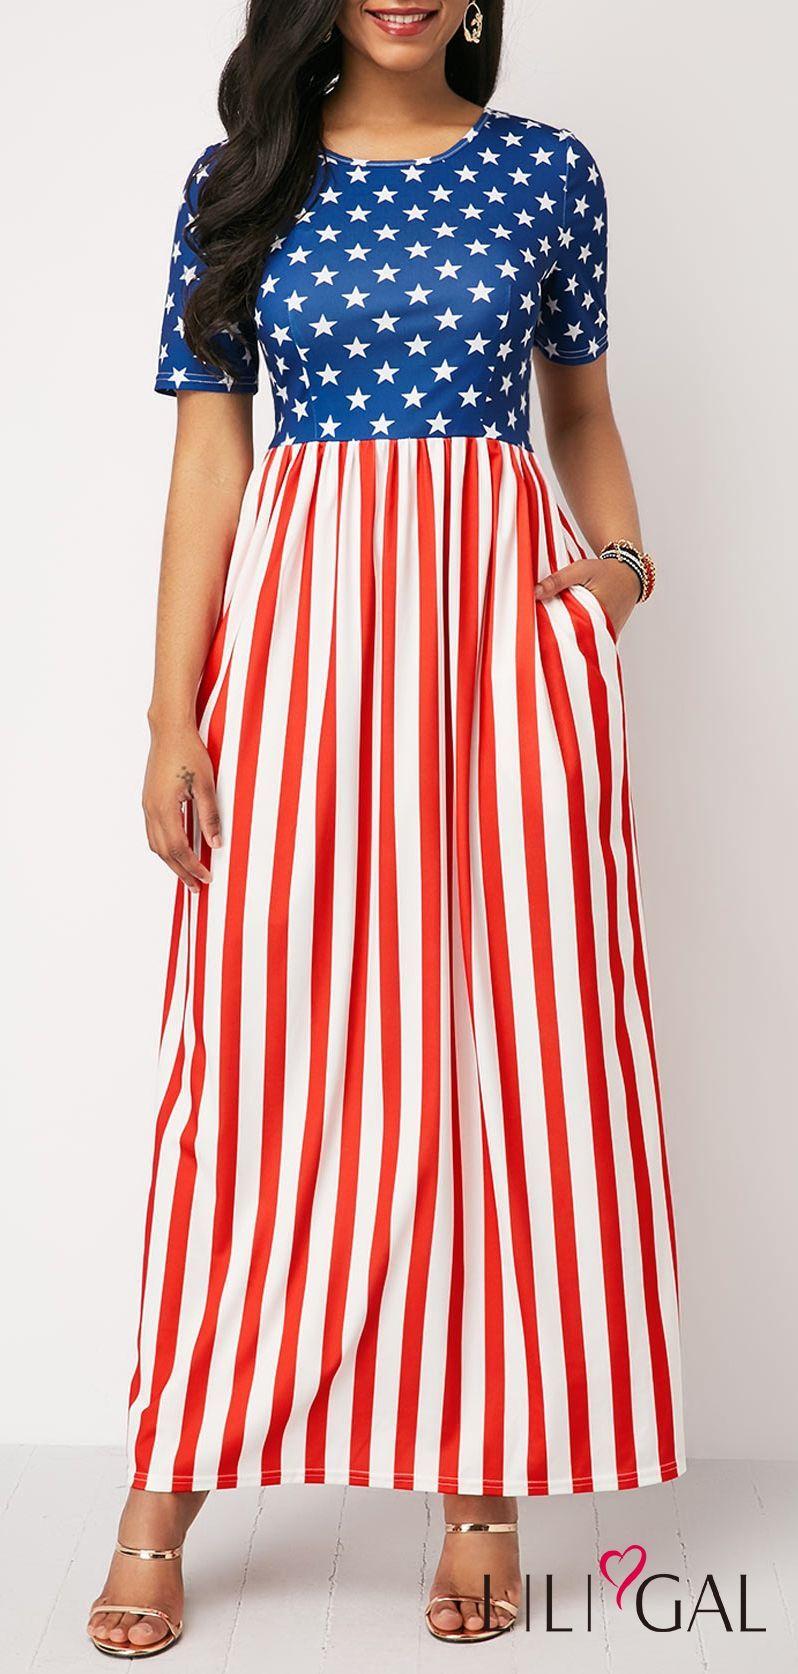 Stripe Print Short Sleeve Cutout Back Dress Liligal 4thofjuly Fourthofjuly Patriotic Cutout Maxi Dress Shop Casual Dresses Striped Print Dresses [ 1674 x 798 Pixel ]